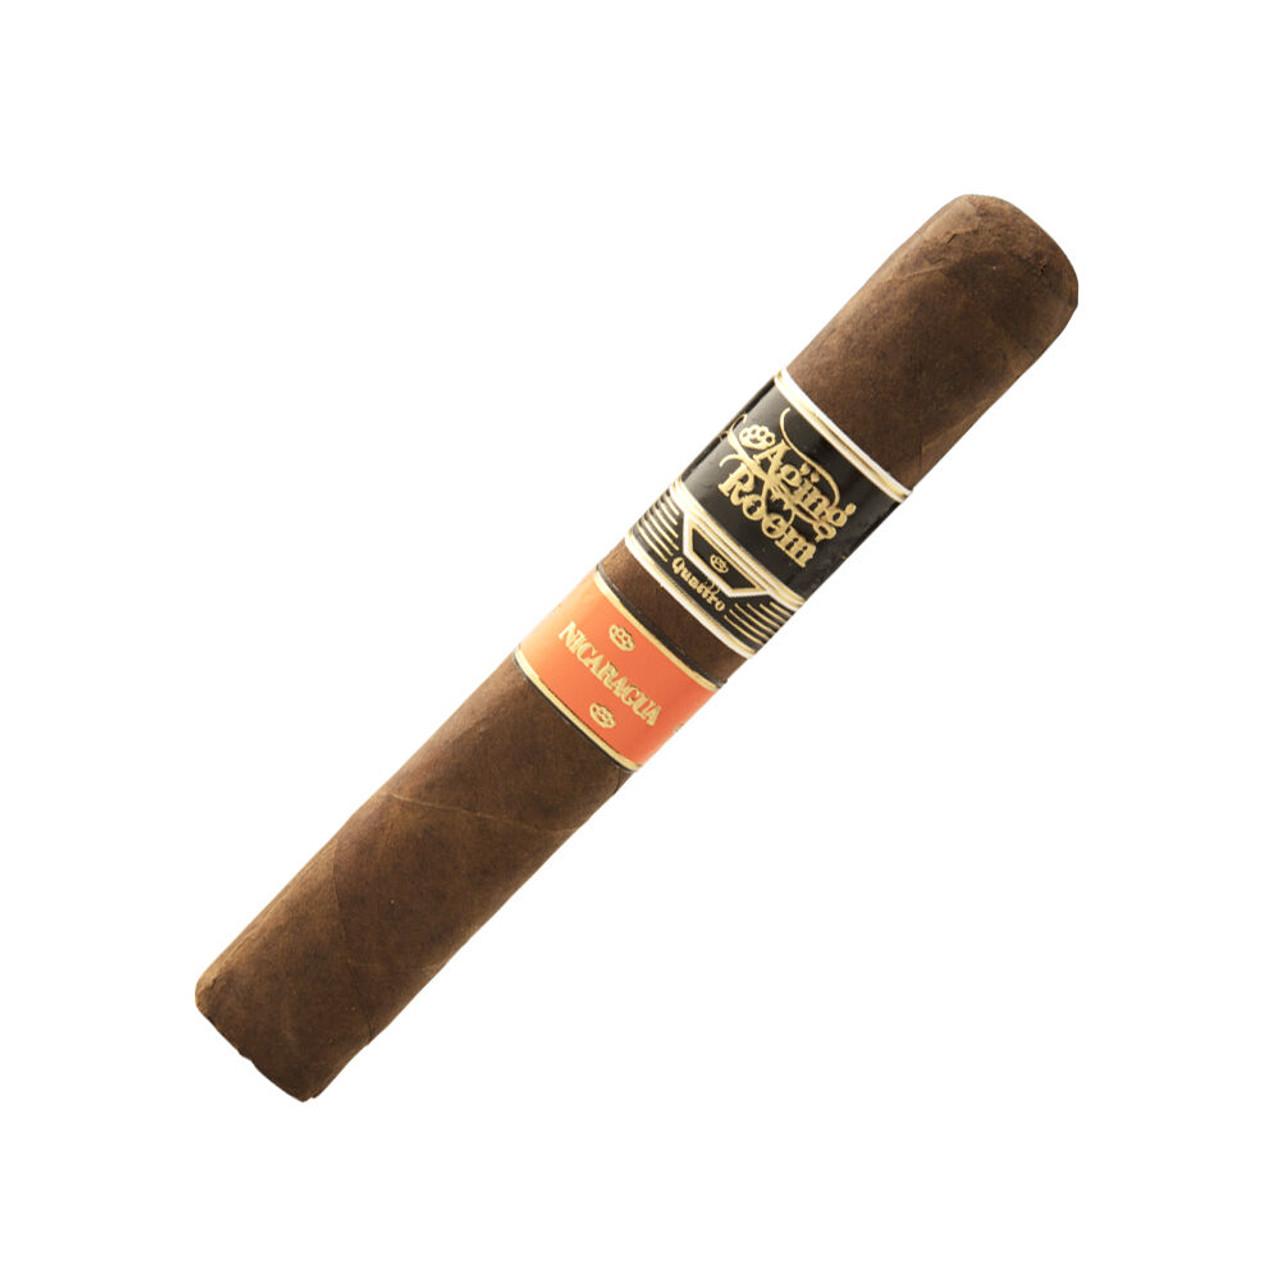 Aging Room Quattro Nicaragua Espressivo Cigars - 5 x 50 (Box of 20)